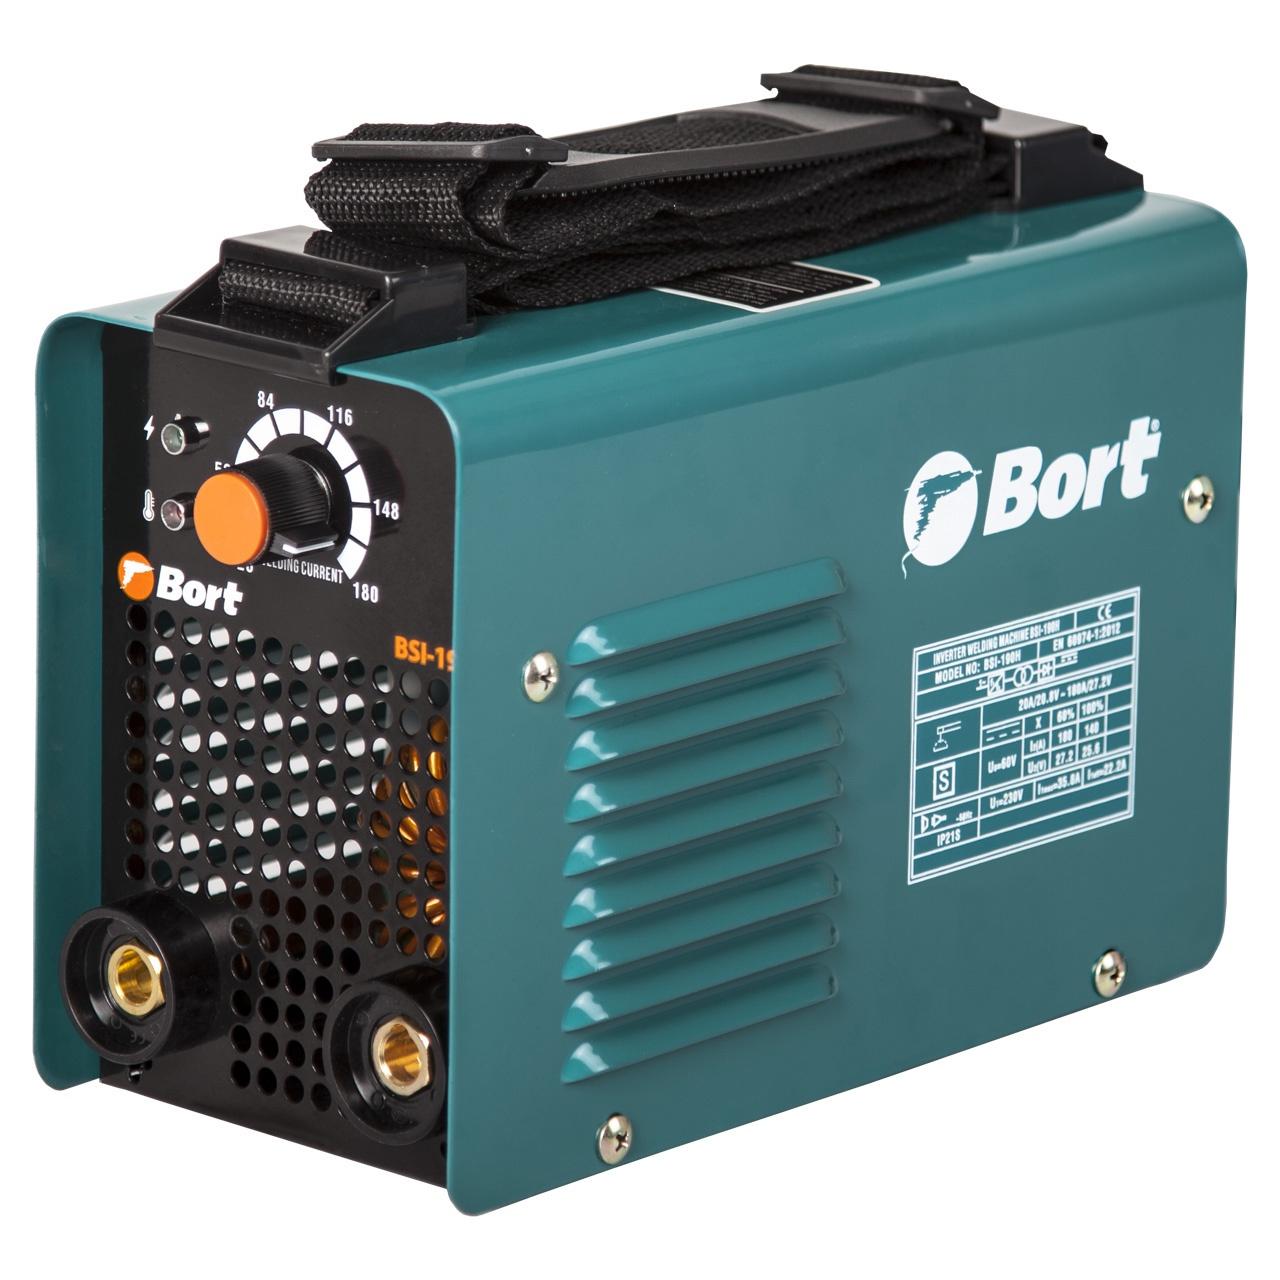 цена на Сварочный аппарат Bort BSI-190H